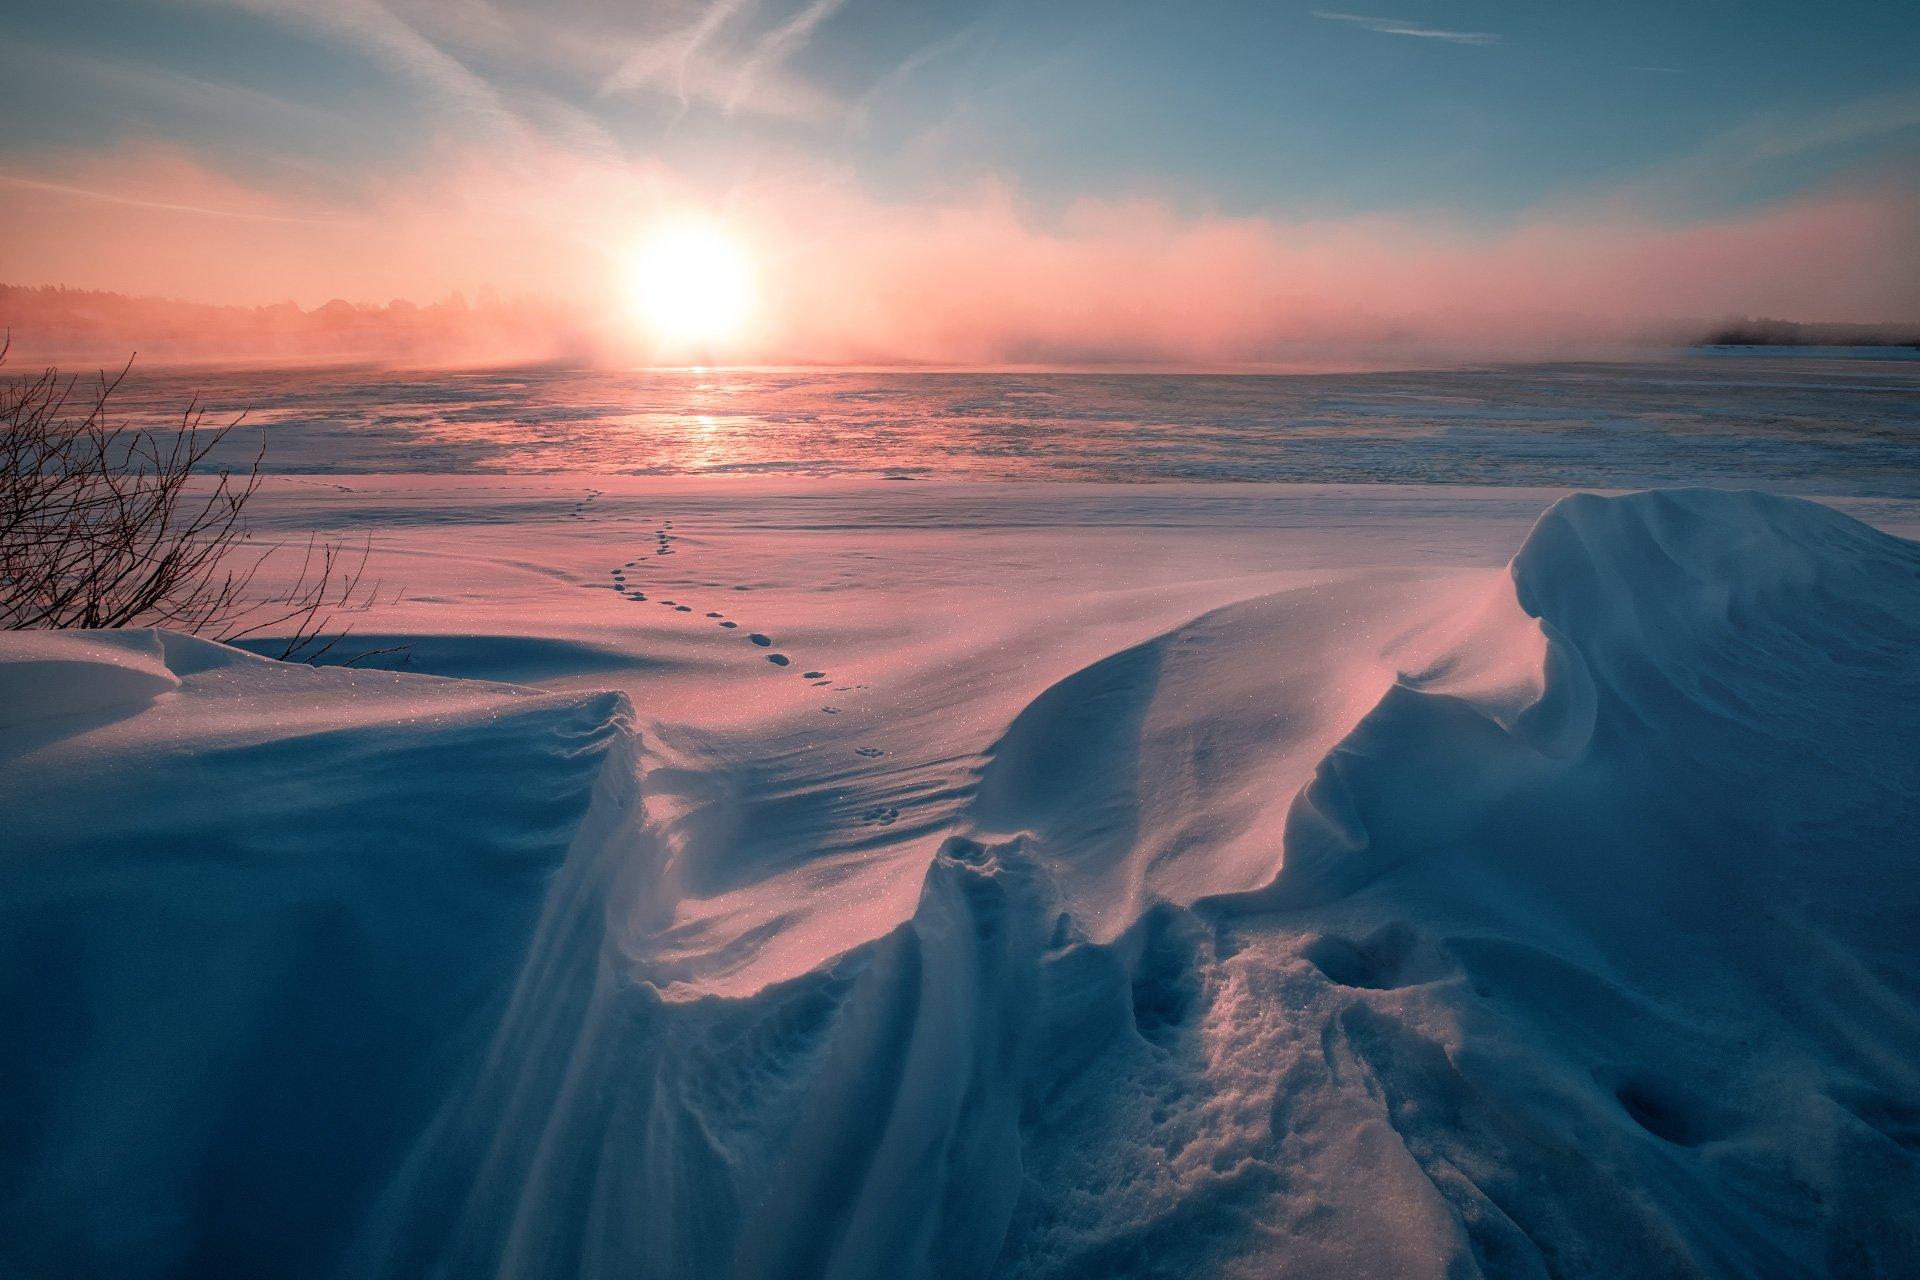 пейзаж, зима, снег, солнце, свет, волга, утро, холод, мороз, март, туман, Андрей Чиж